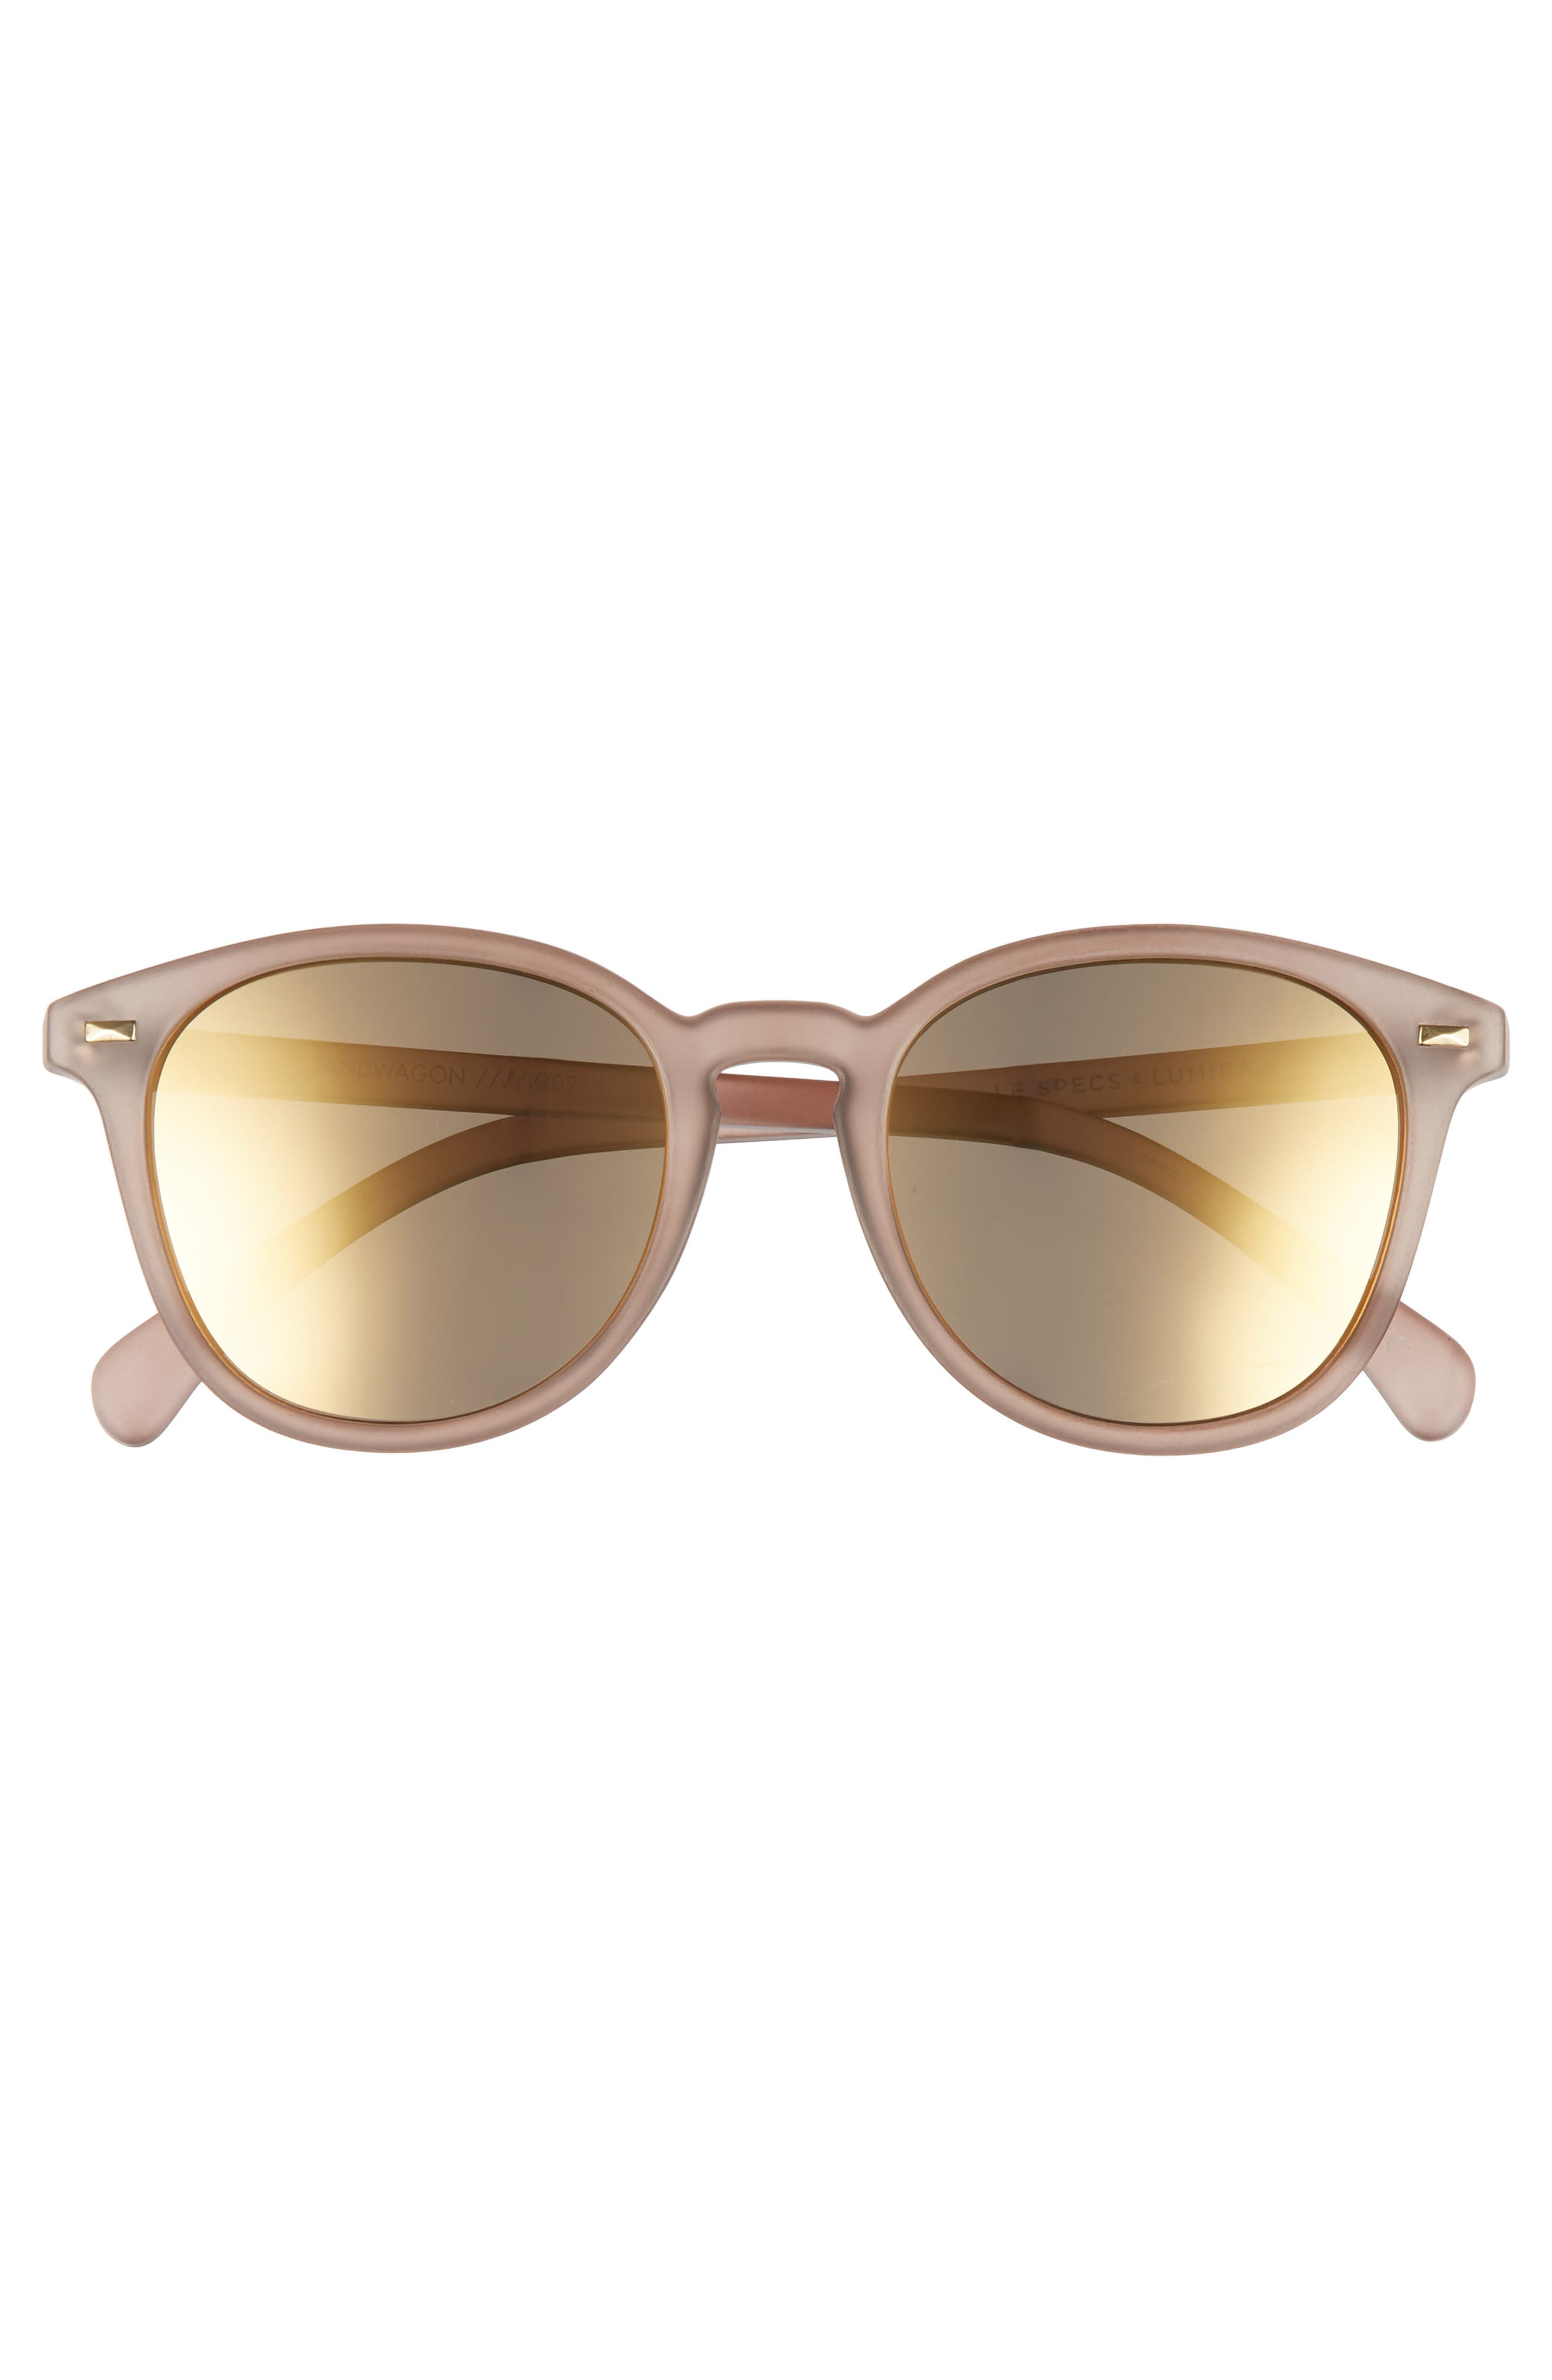 x Lumira Bandwagon 51mm Sunglasses & Candle Gift Set,                             Alternate thumbnail 3, color,                             020